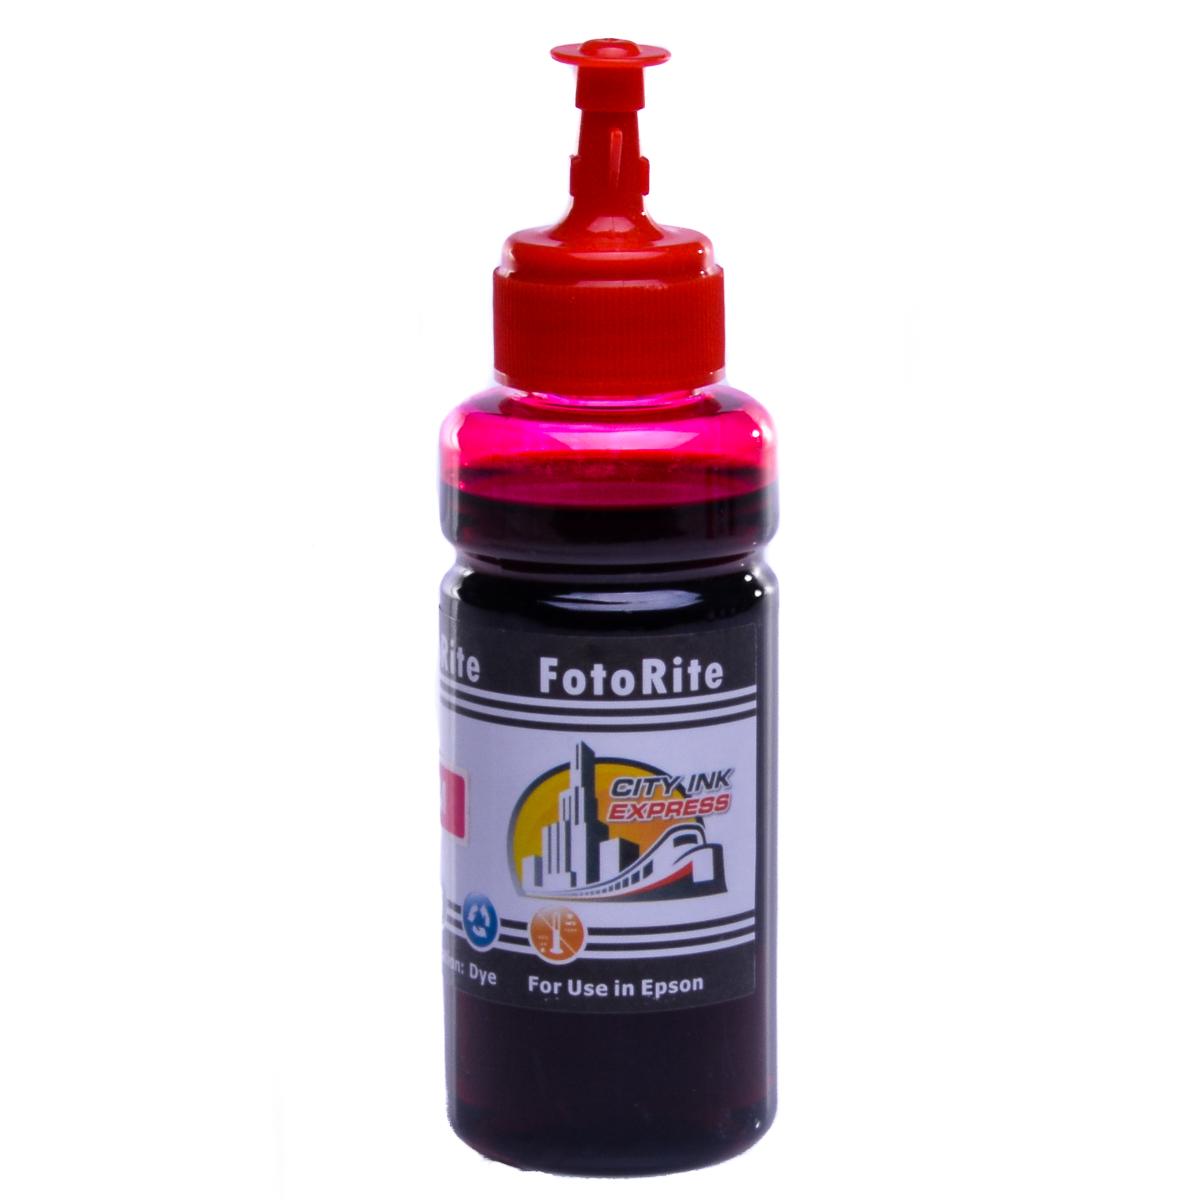 Cheap Magenta dye ink replaces Epson Stylus D92 - T0713